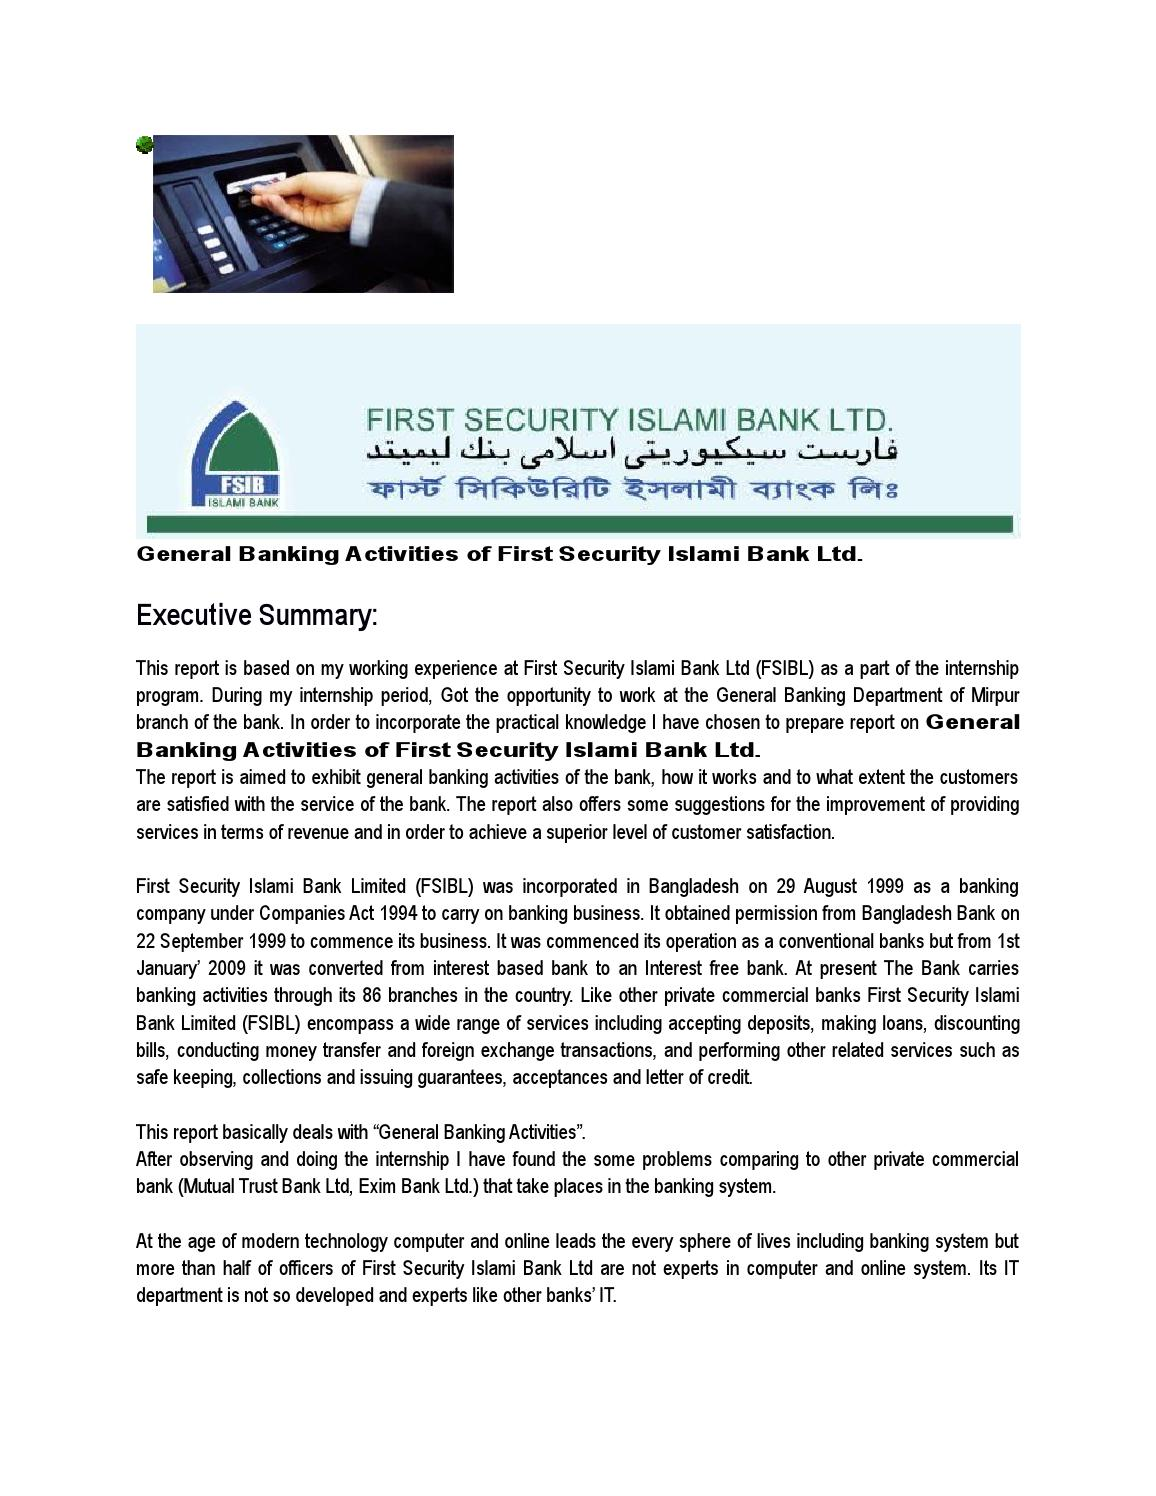 Internship report of first security islami bank